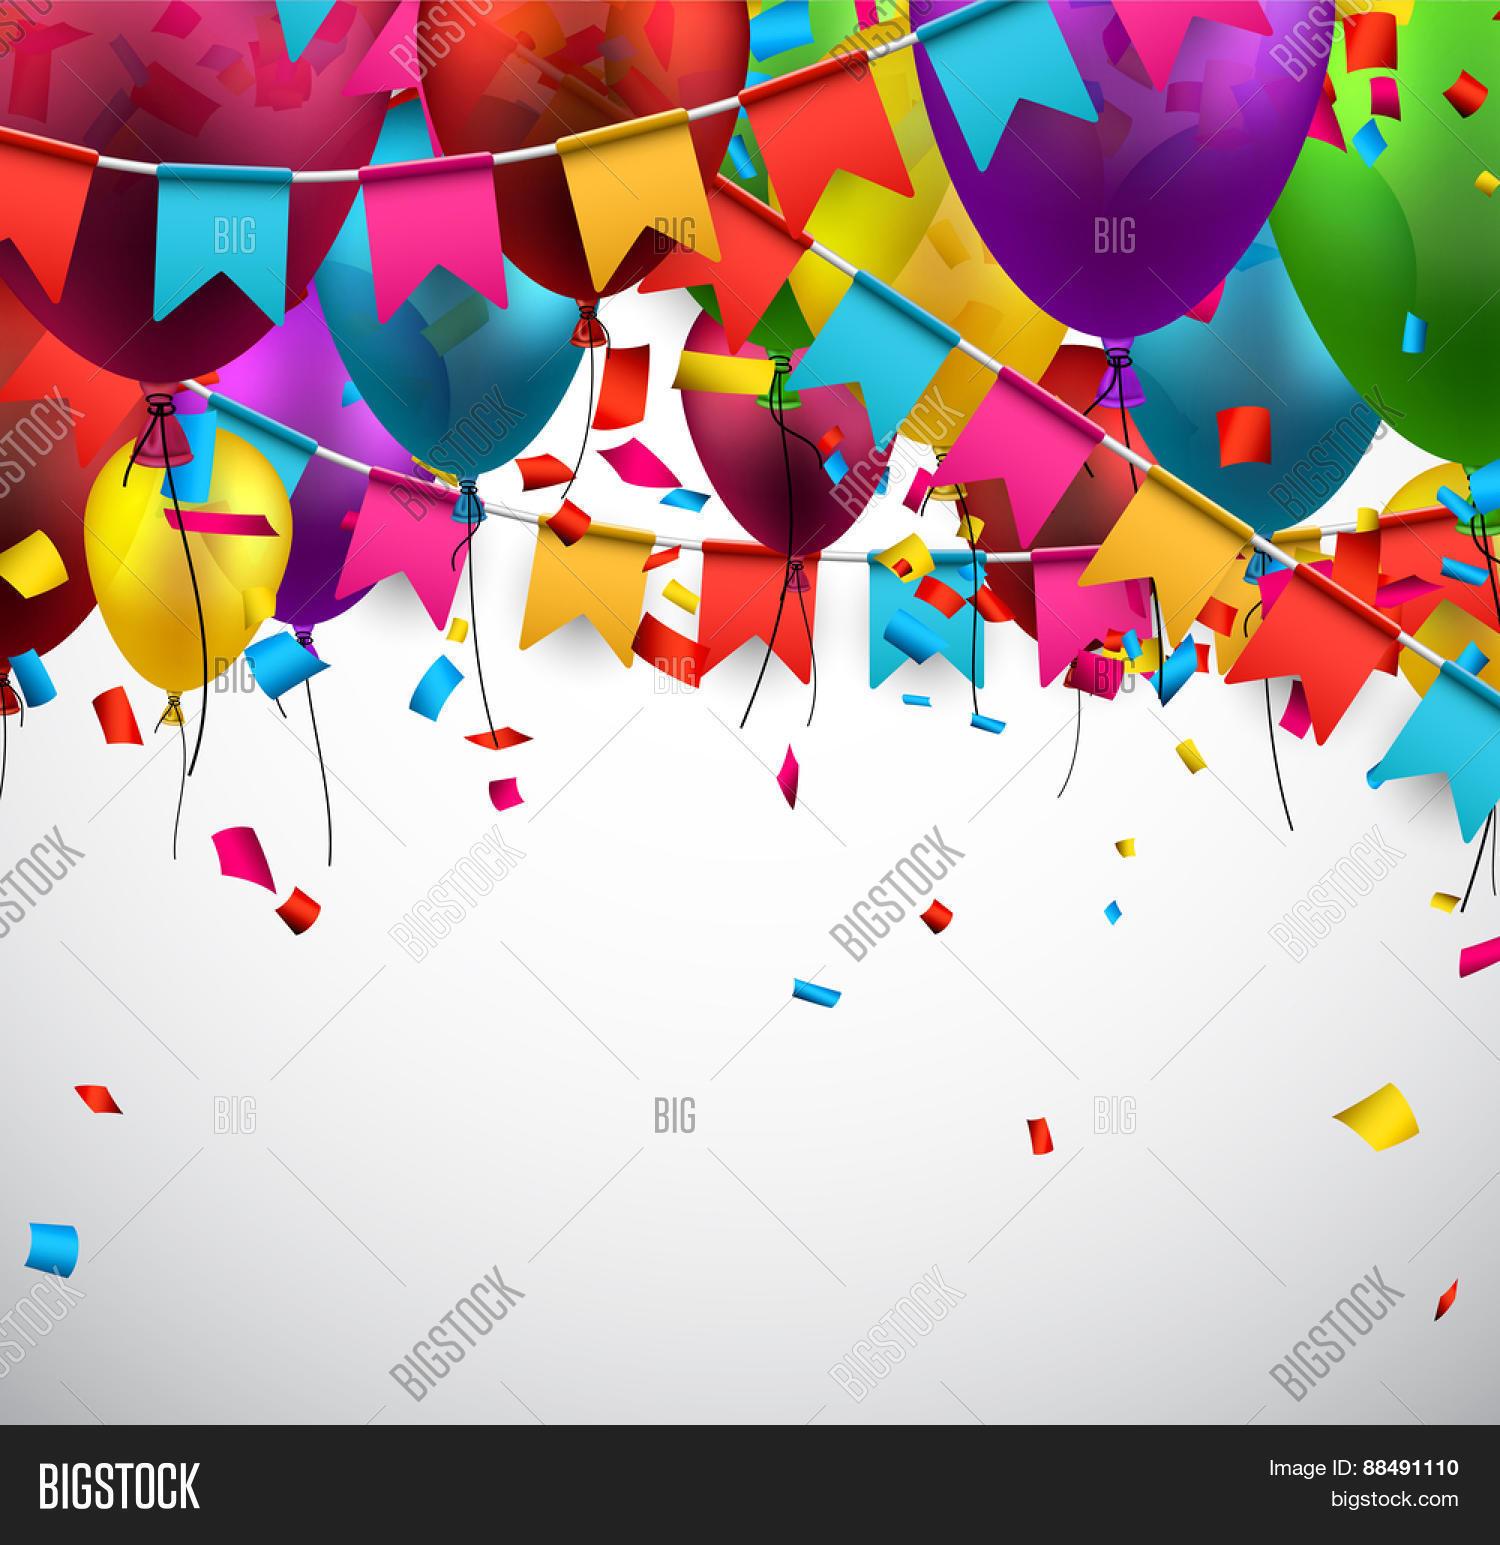 balloons celebration wallpaper - photo #43